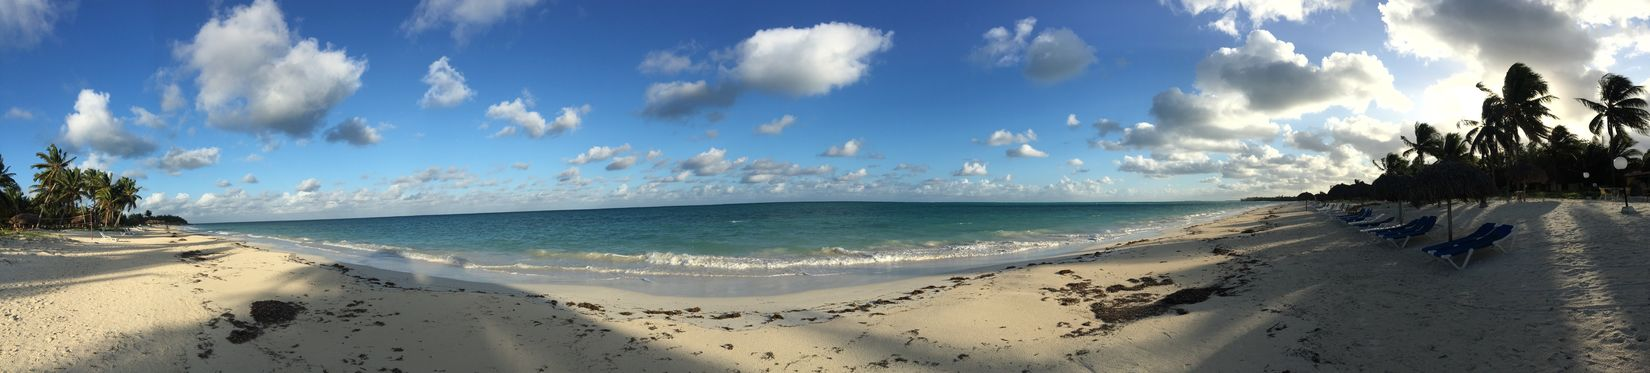 Cuba Beach Sea Sand Horizon Over Water Sky Nature Shore Outdoors Water Sunlight